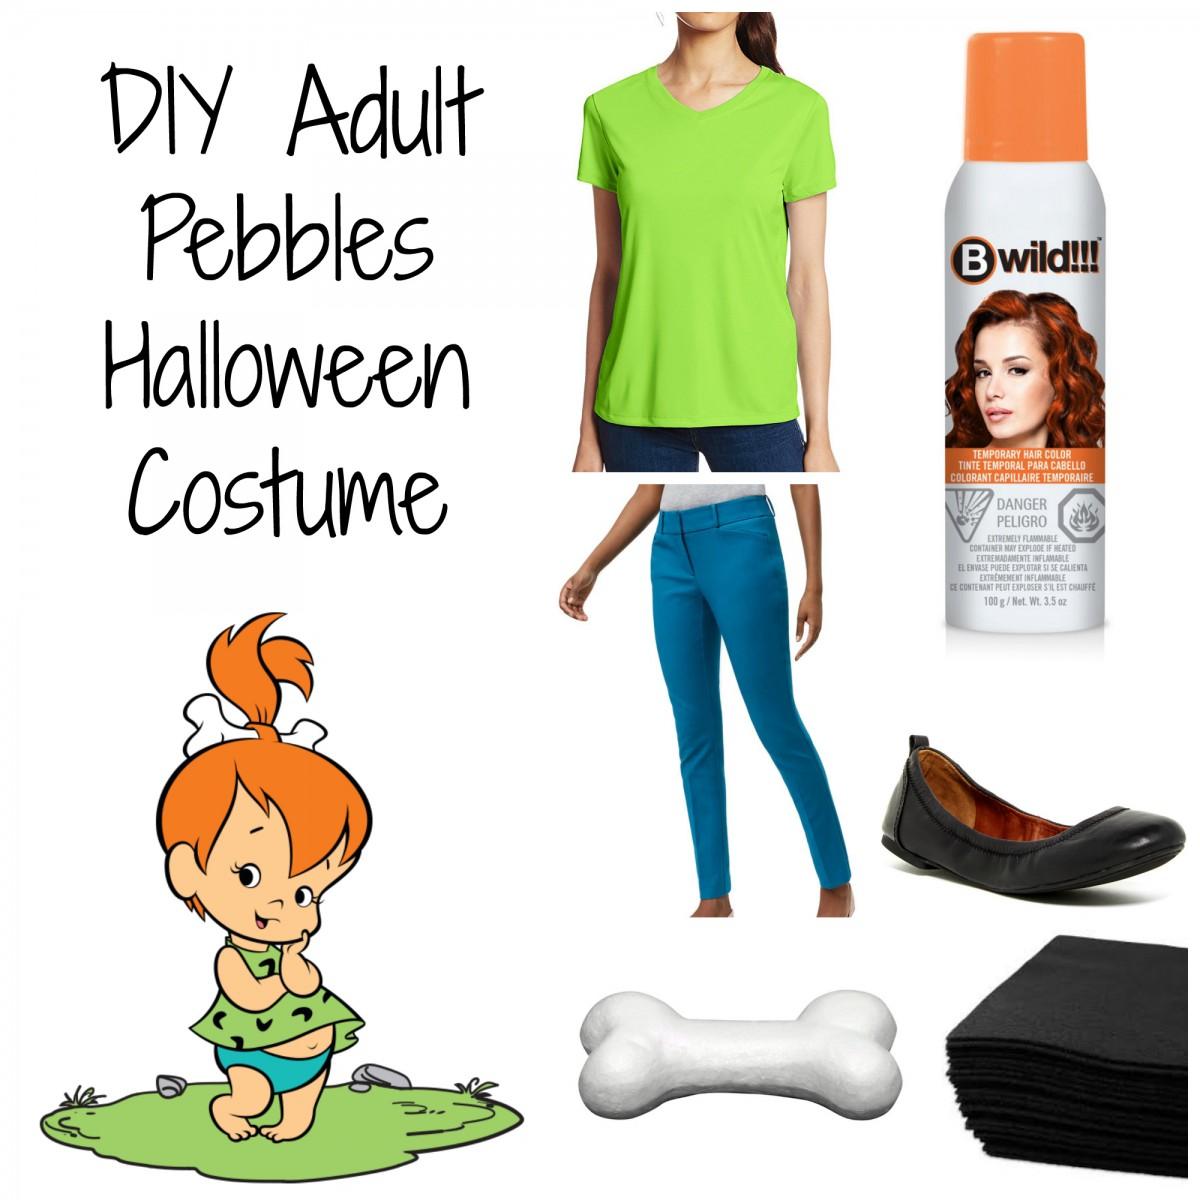 DIY Adult Pebbles Halloween Costume Her Heartland Soul